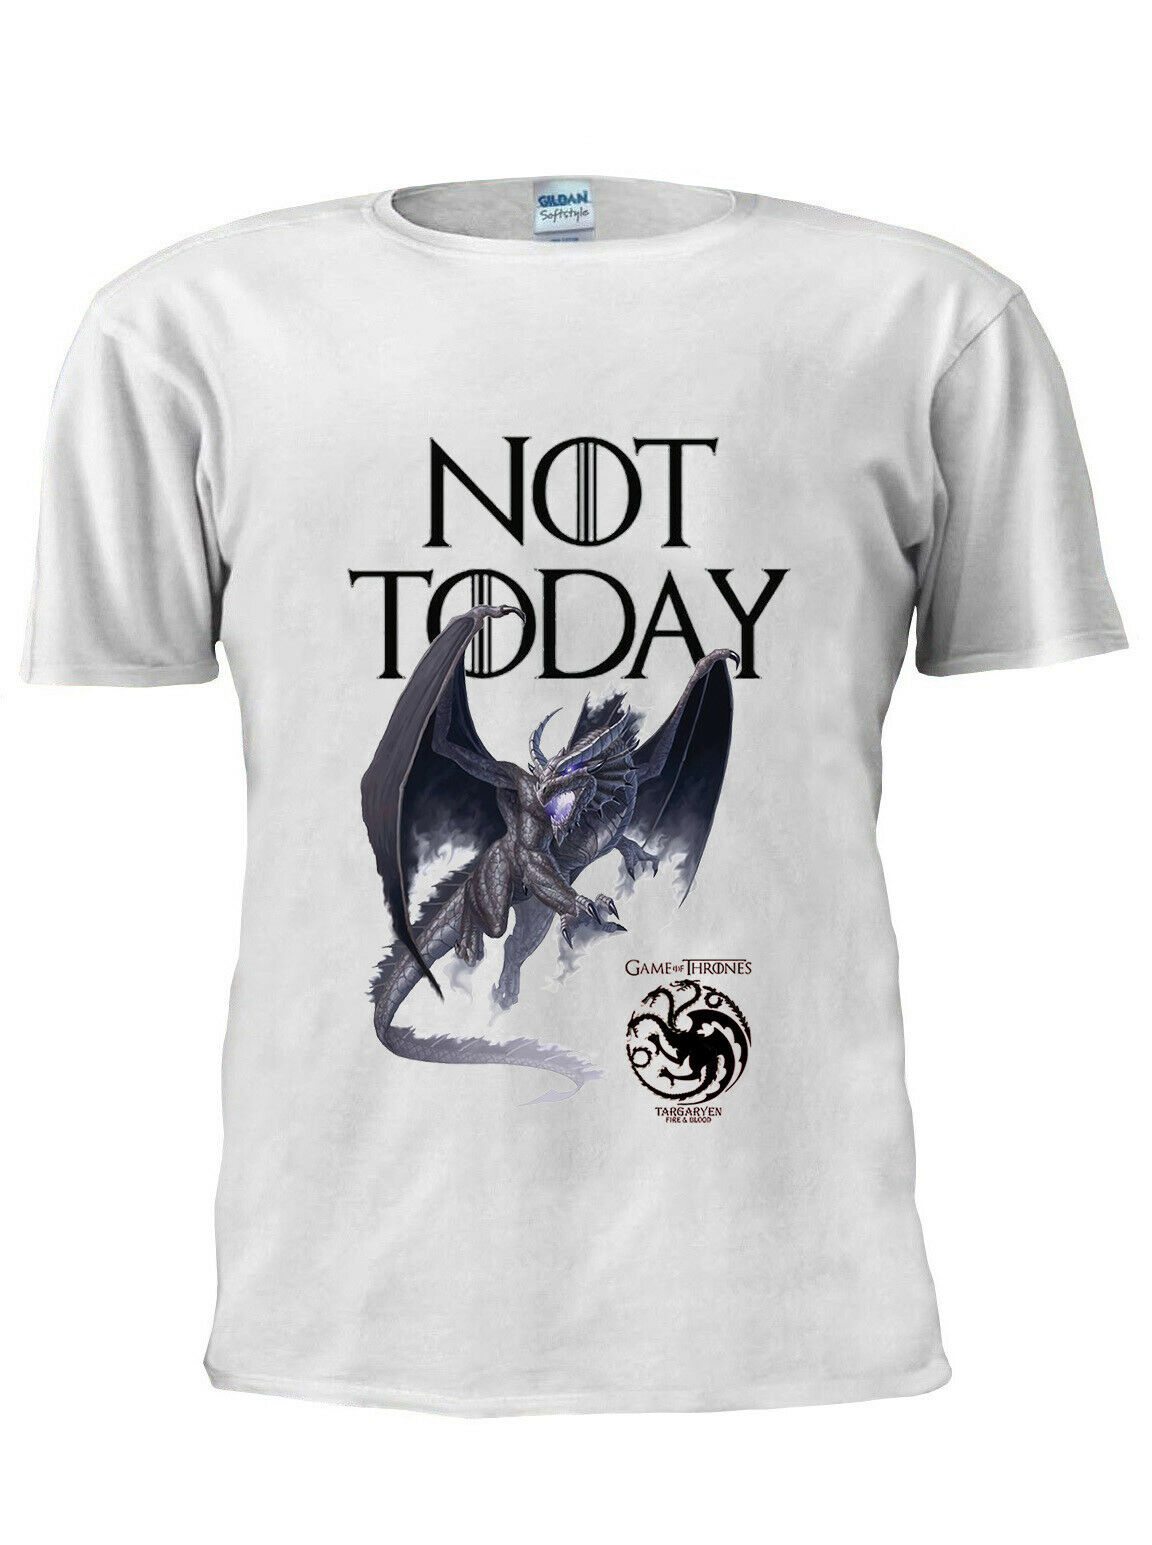 T-Shirt Game OF Thrones Arya Stark pas aujourd'hui hommes femmes unisexe T-Shirt M211 100% coton T-Shirt 2019 chaud t-shirts hauts en gros T-Shirt